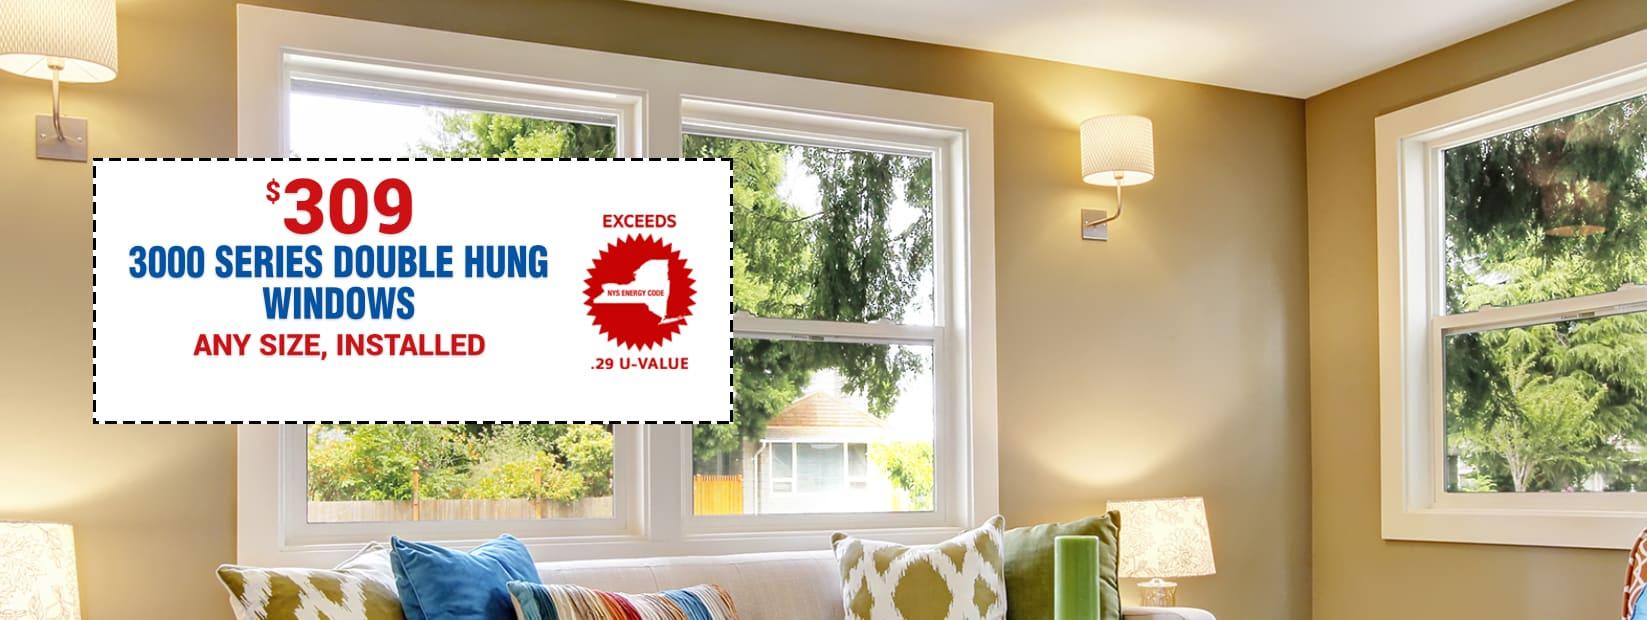 3000 Series Double Hung Windows